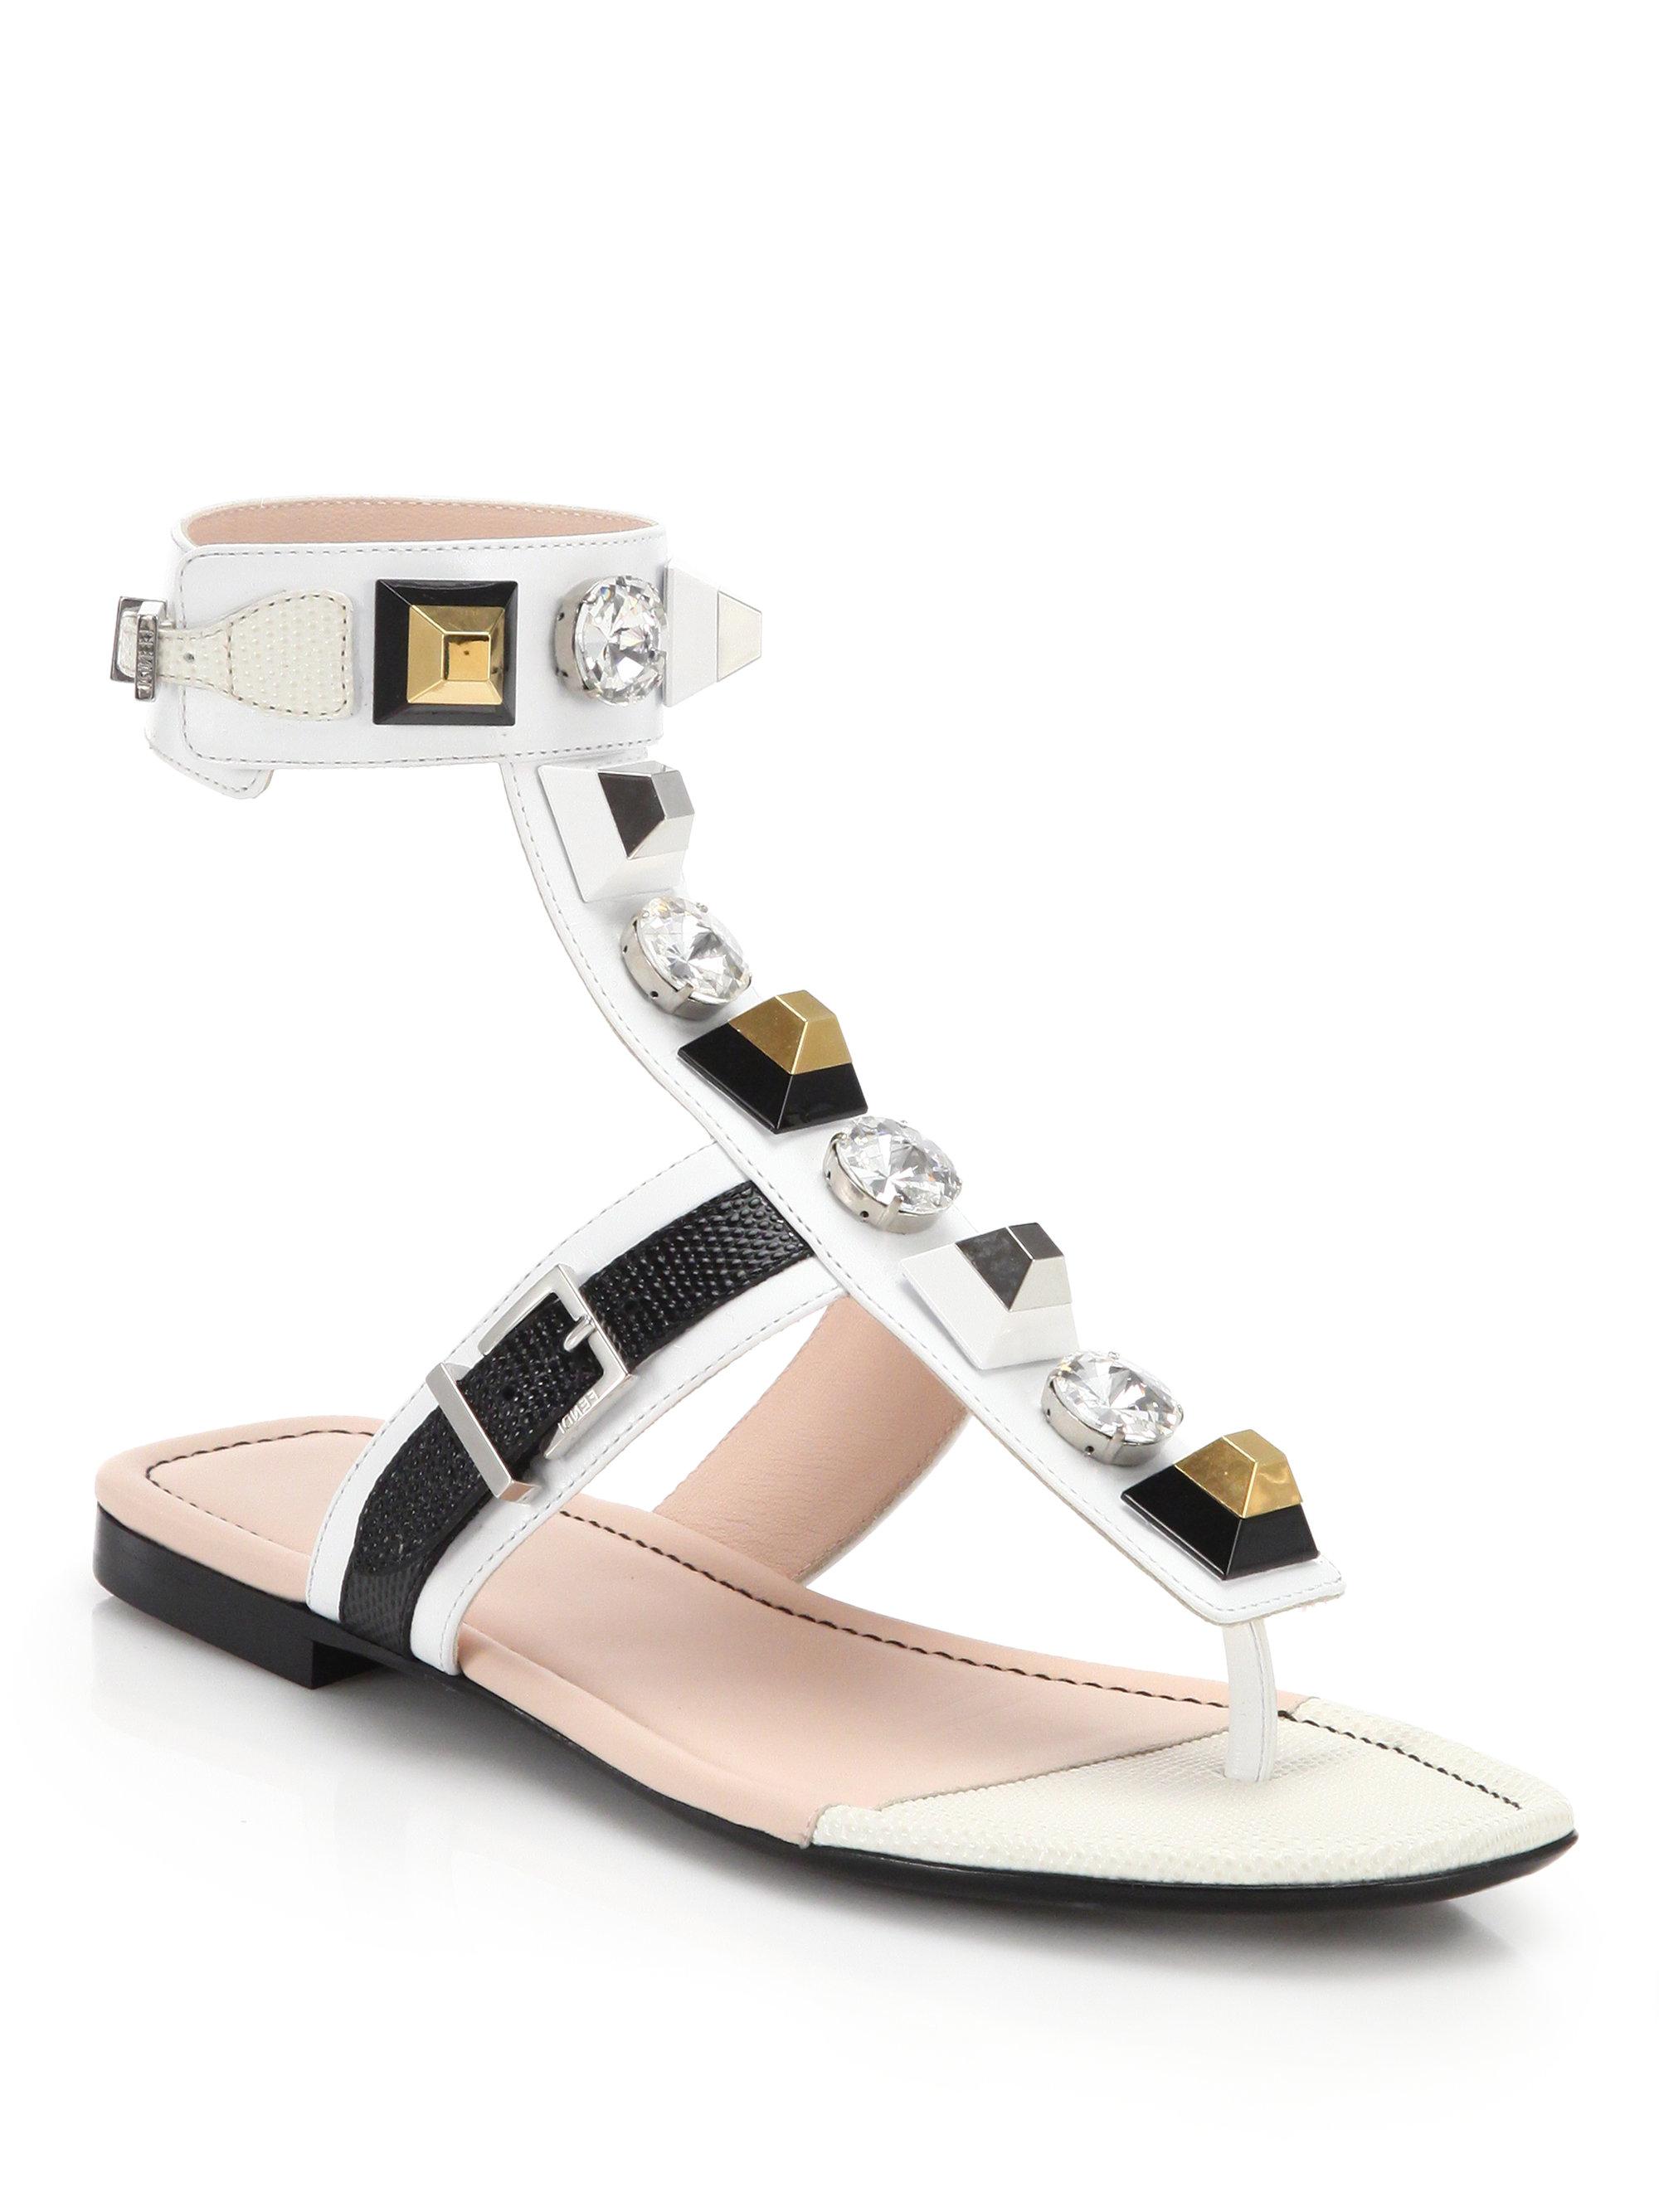 9f52d114bd8b25 Lyst - Fendi Embellished Leather Sandals